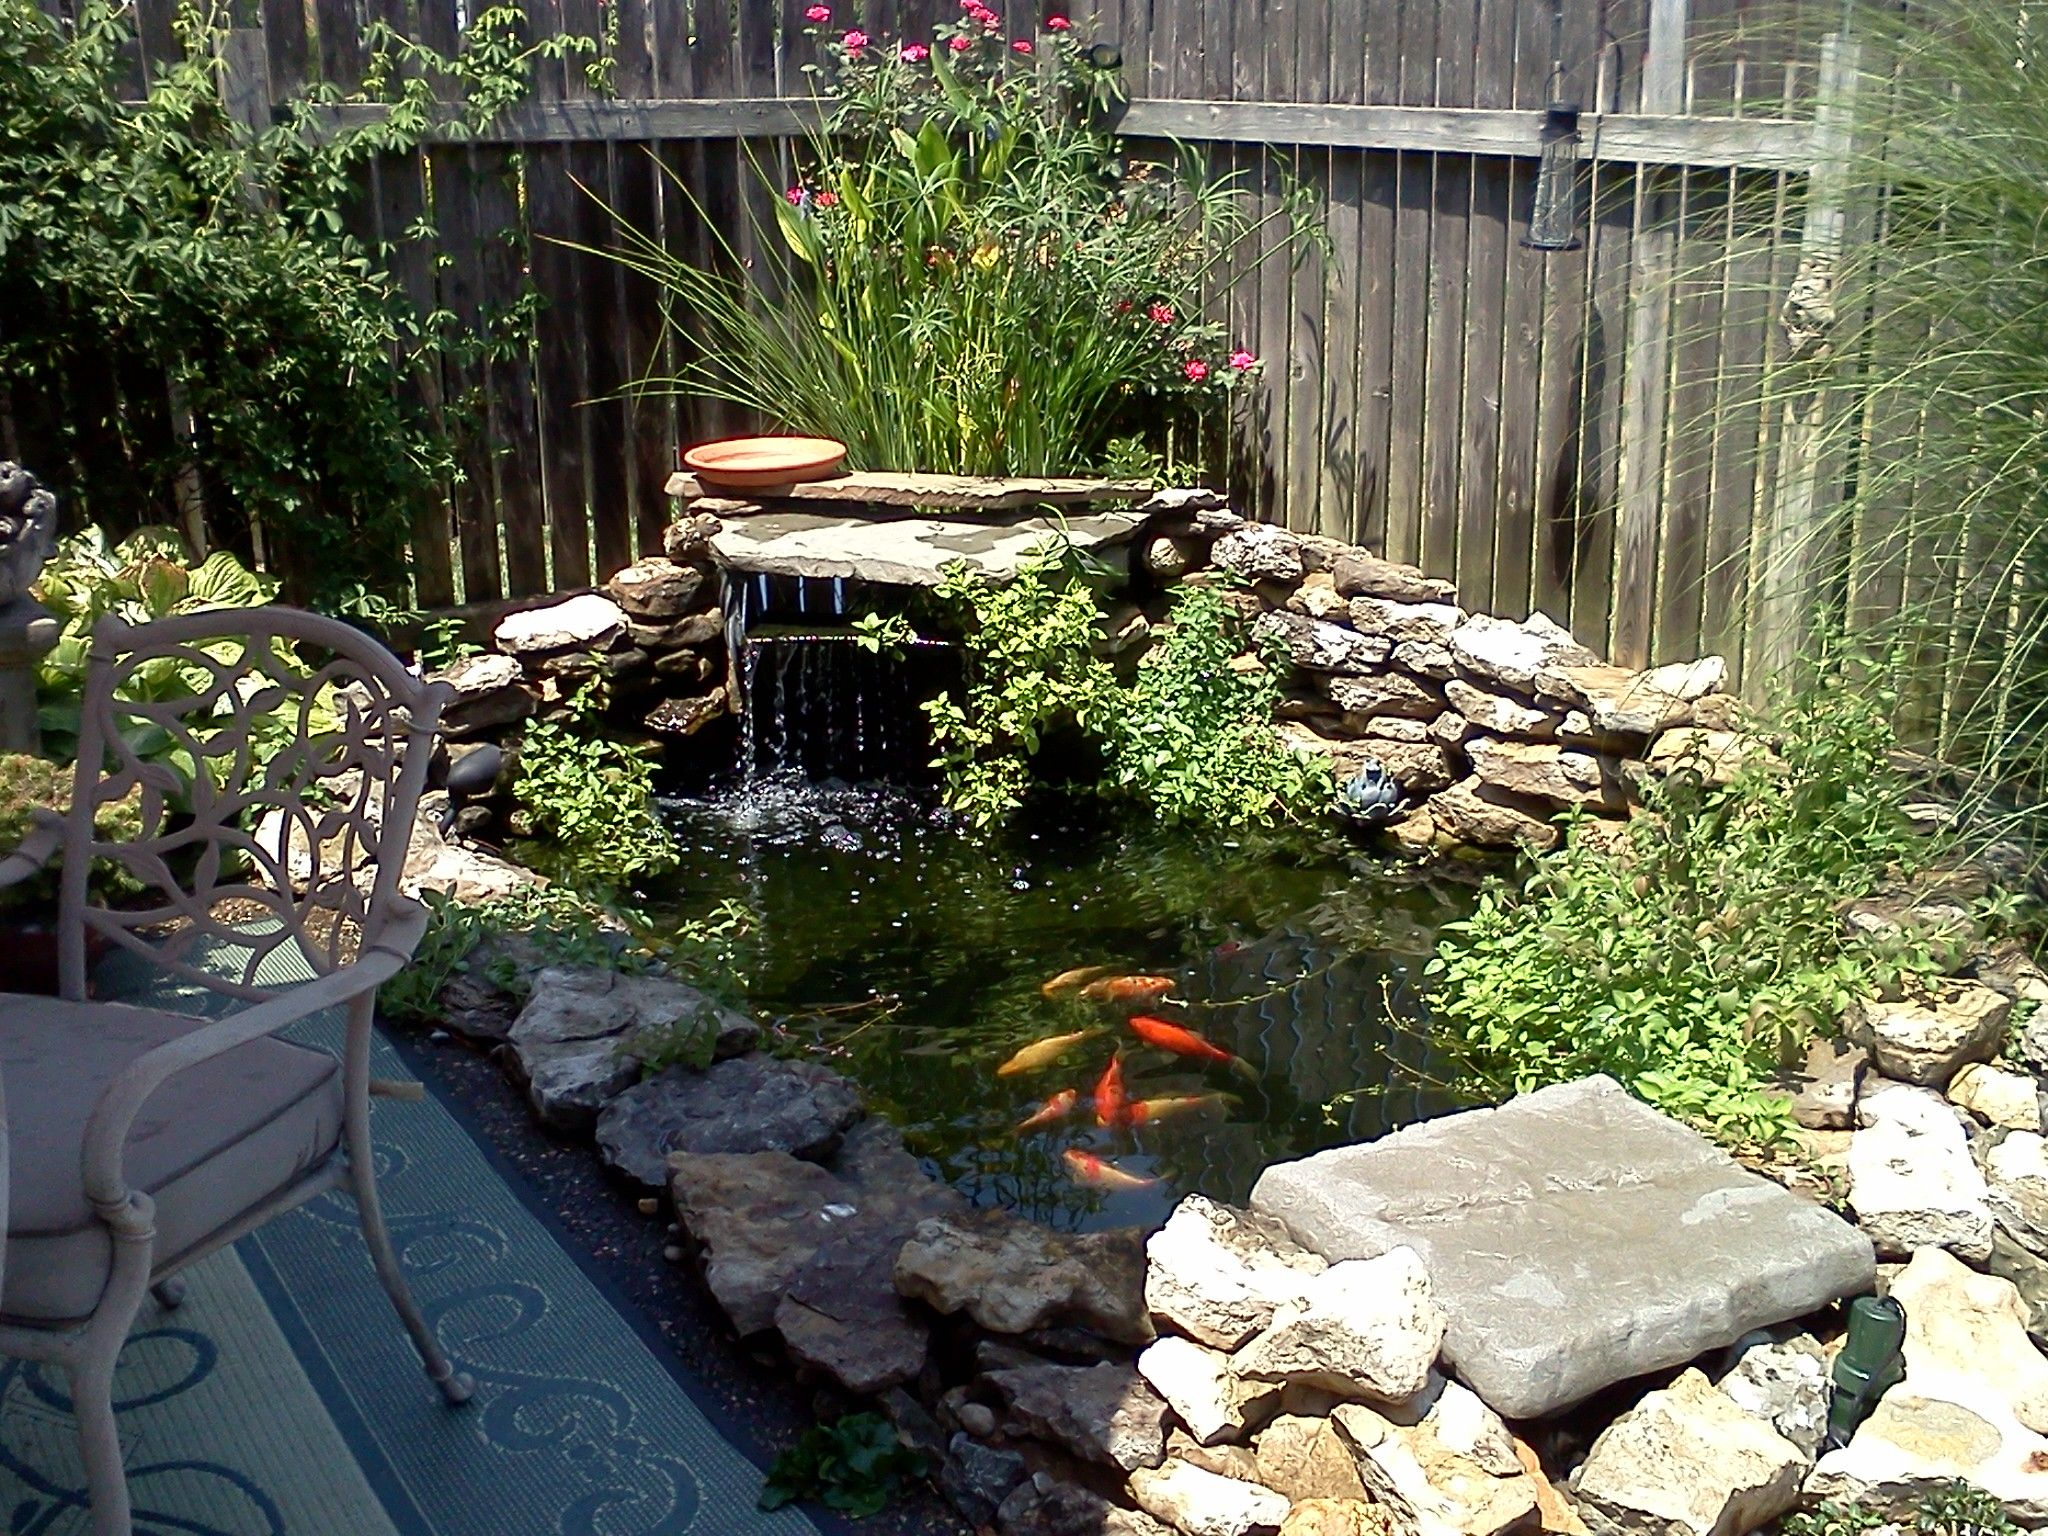 My Backyard Fish Pond Ponds Backyard Fish Pond Gardens Backyard Garden Design